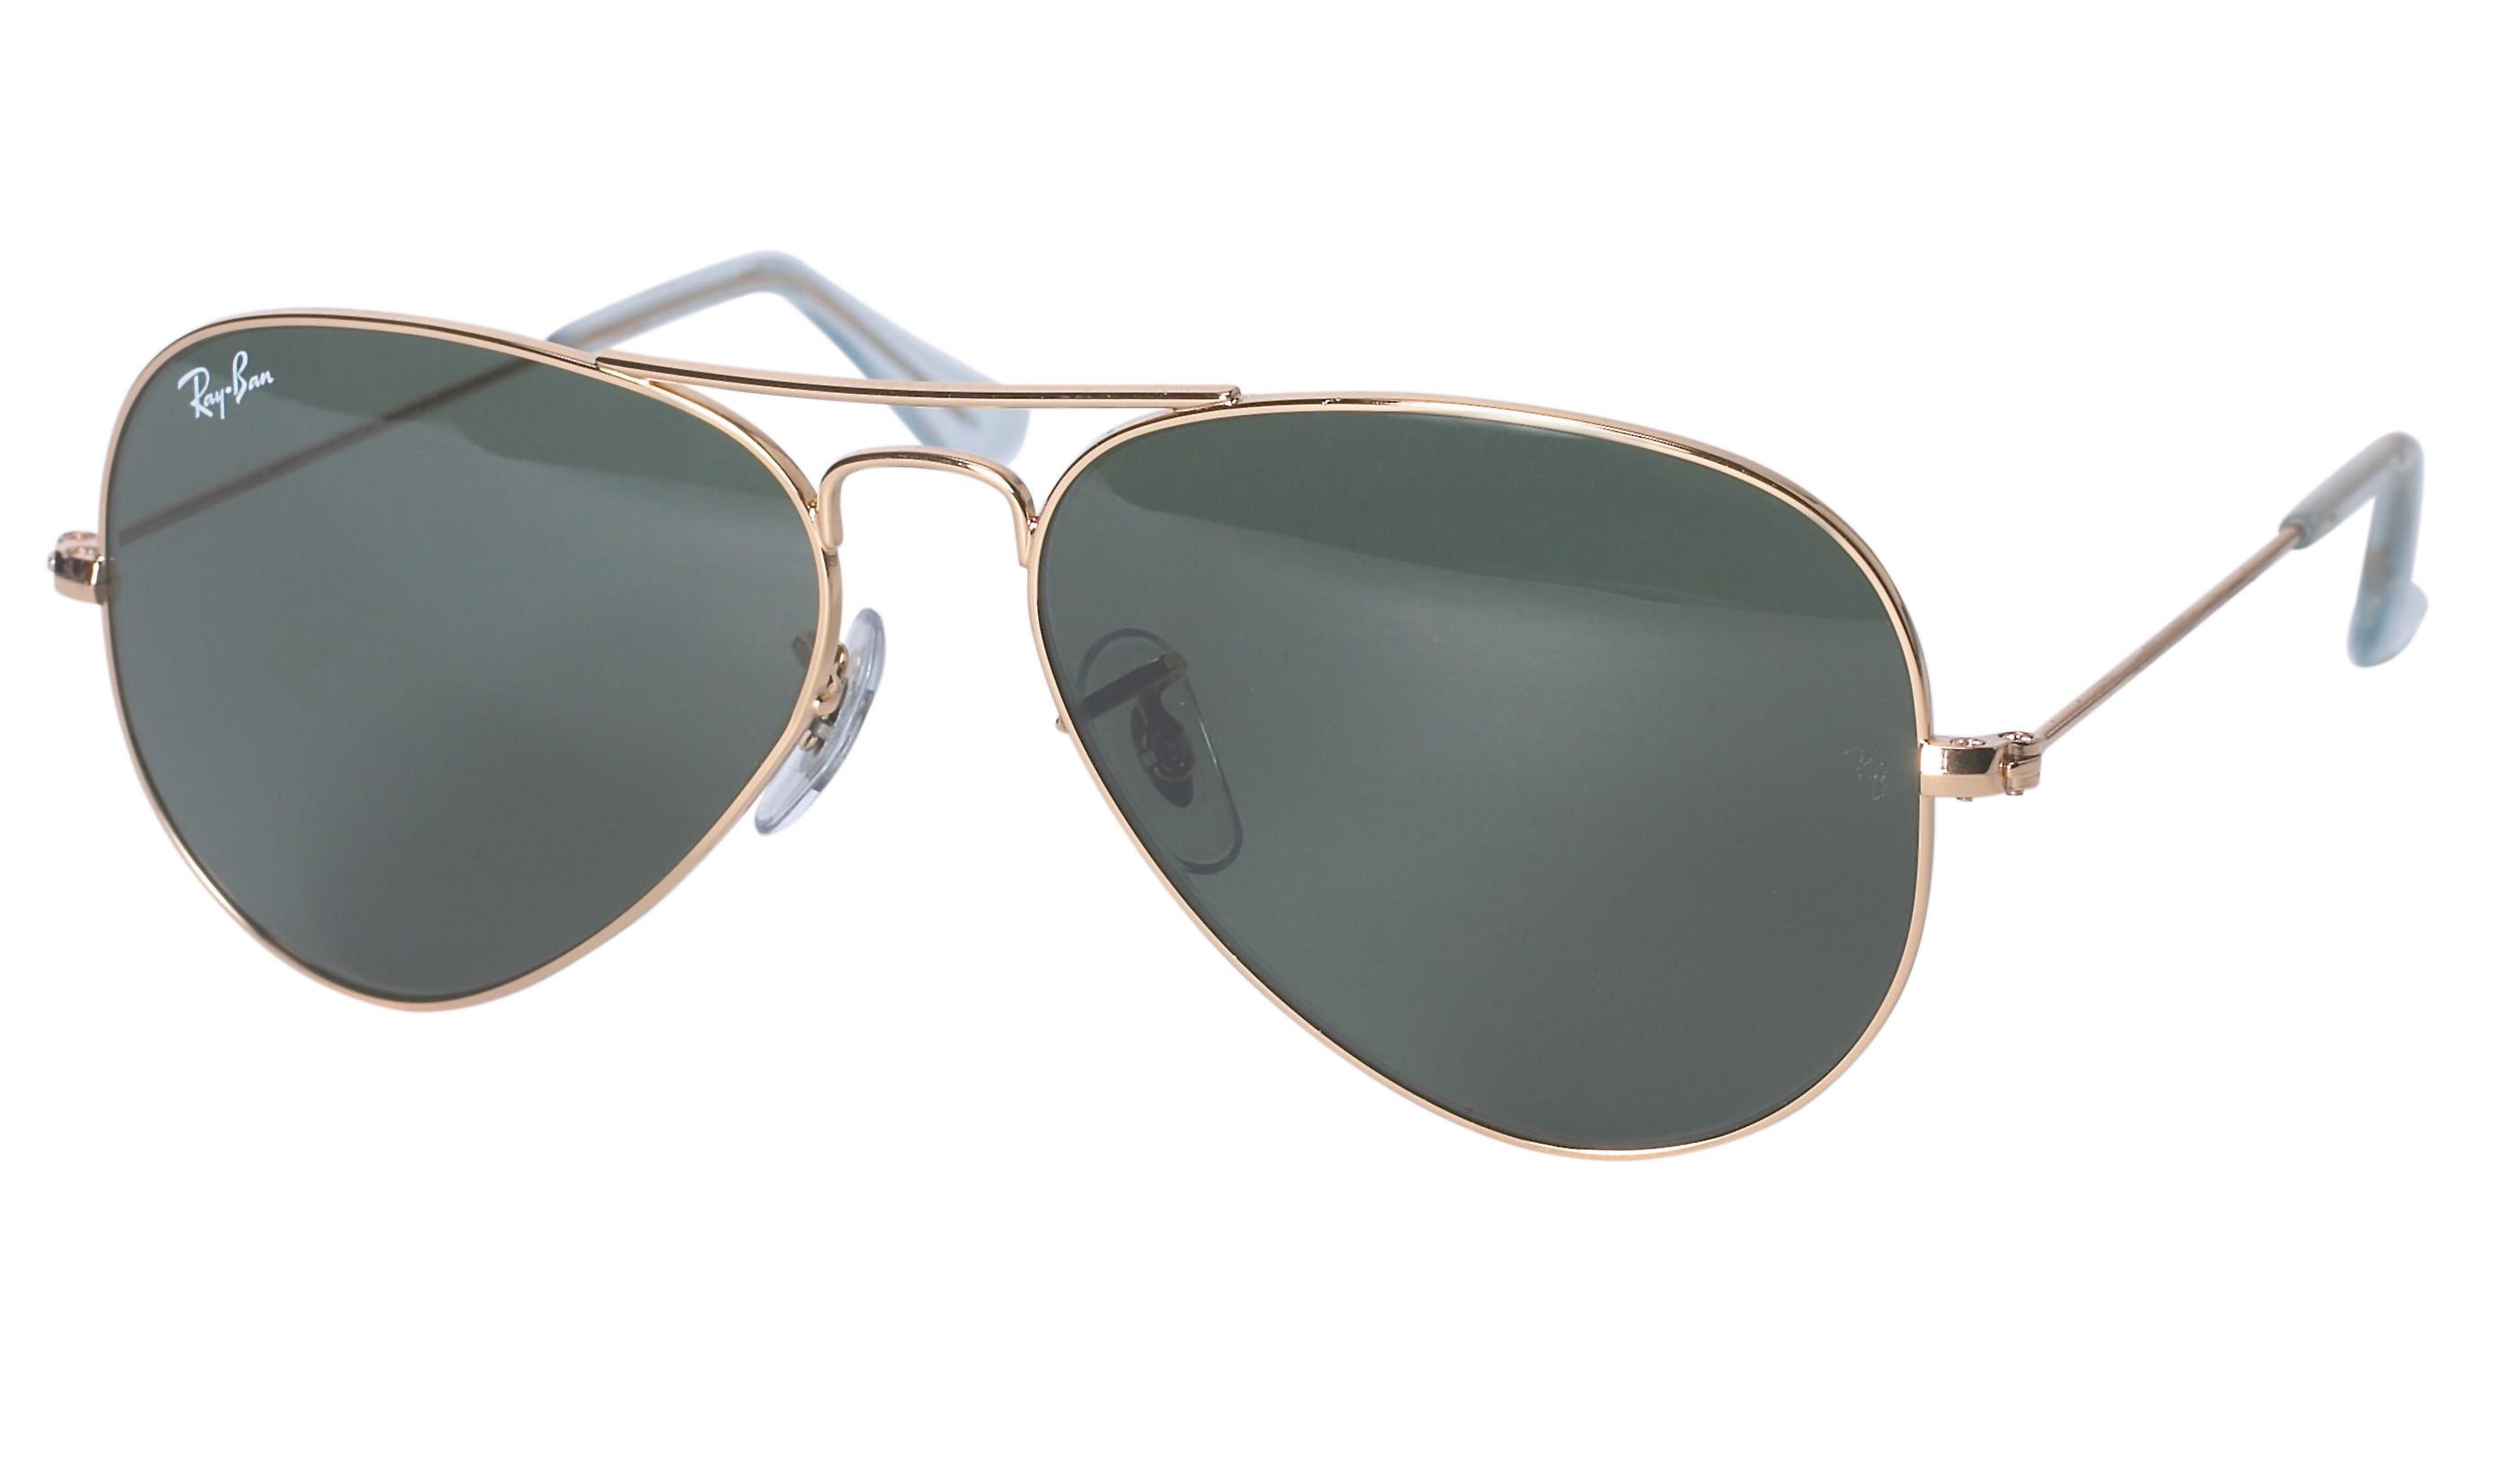 Rayban ottica rayban siena occhiali rayban siena - Occhiali ray ban aviator specchio ...